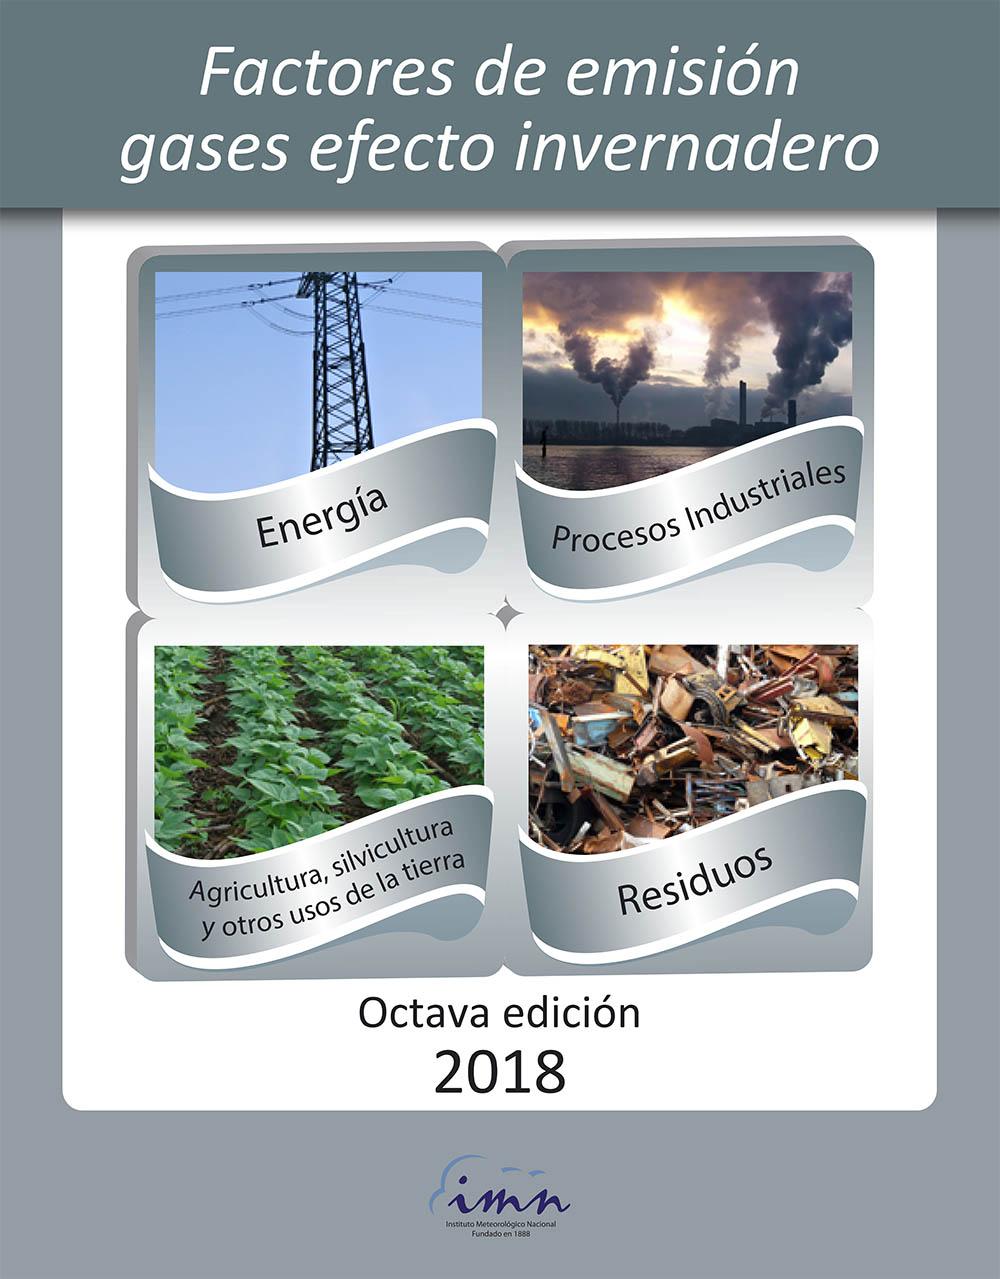 Factores de emisión GEI, Octava edición, 2018